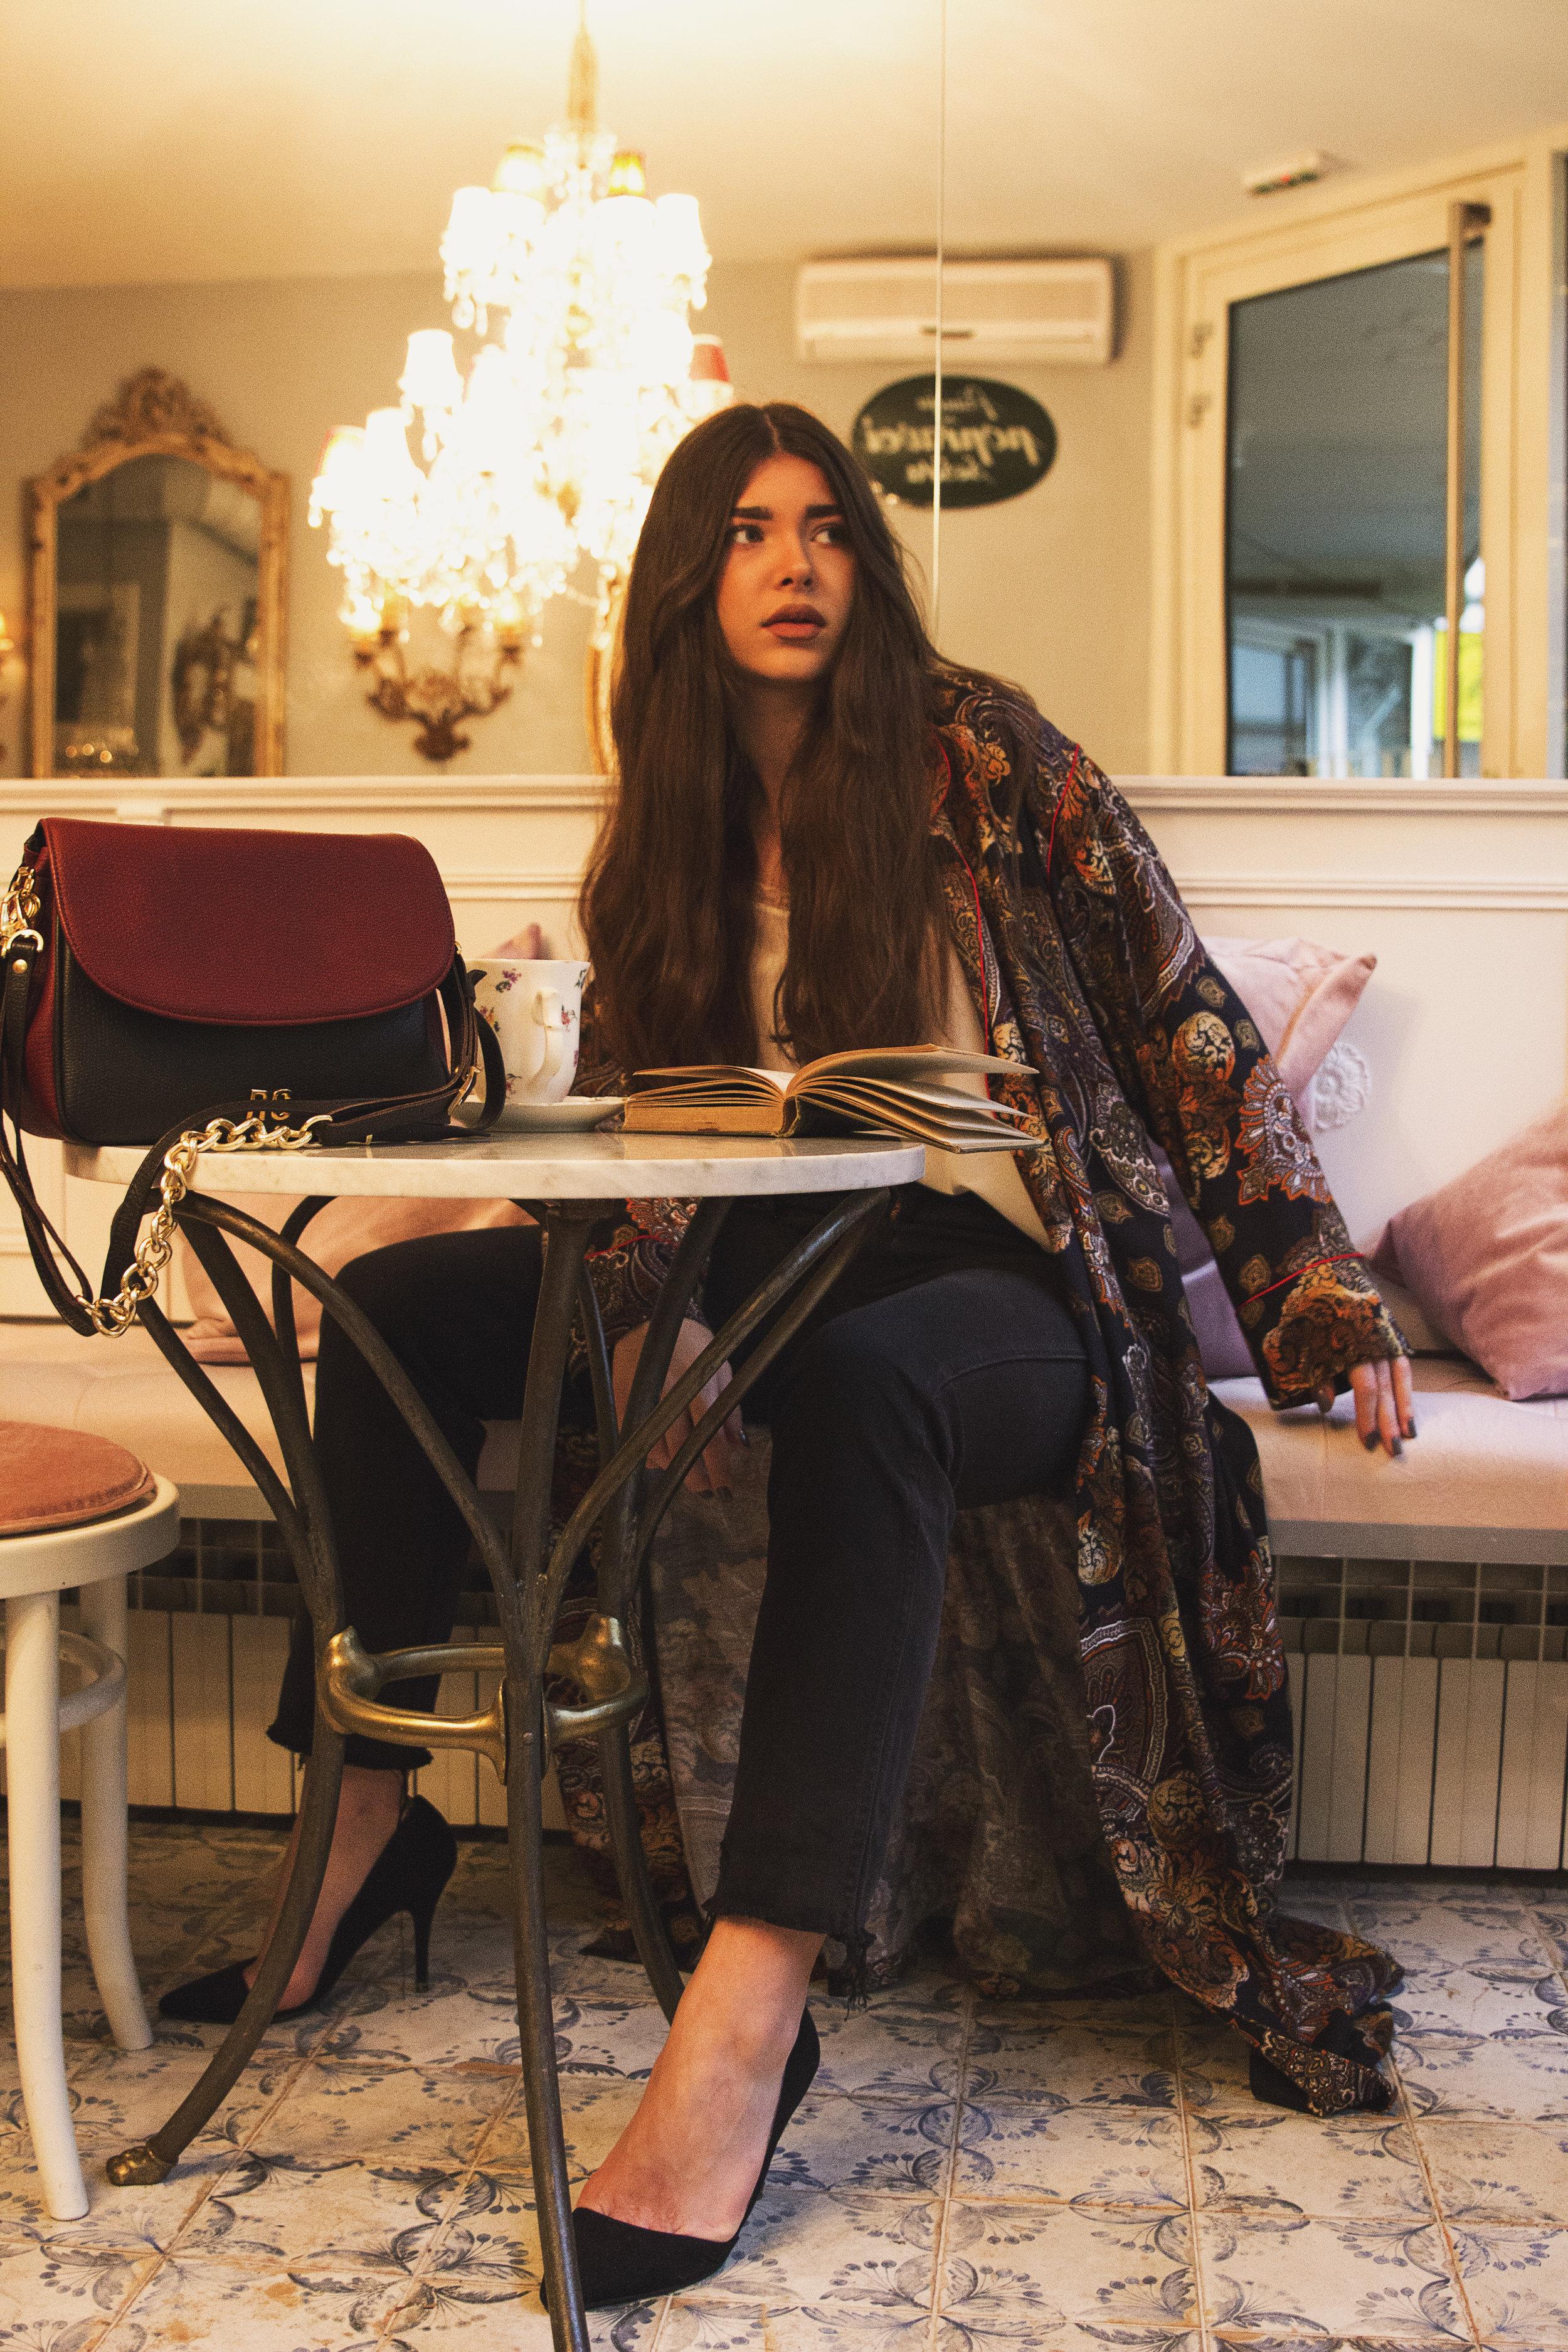 fashion-editorial-robert-sever-caffe-bar-finjak-expensive-reality-fashion-photography (3).jpg